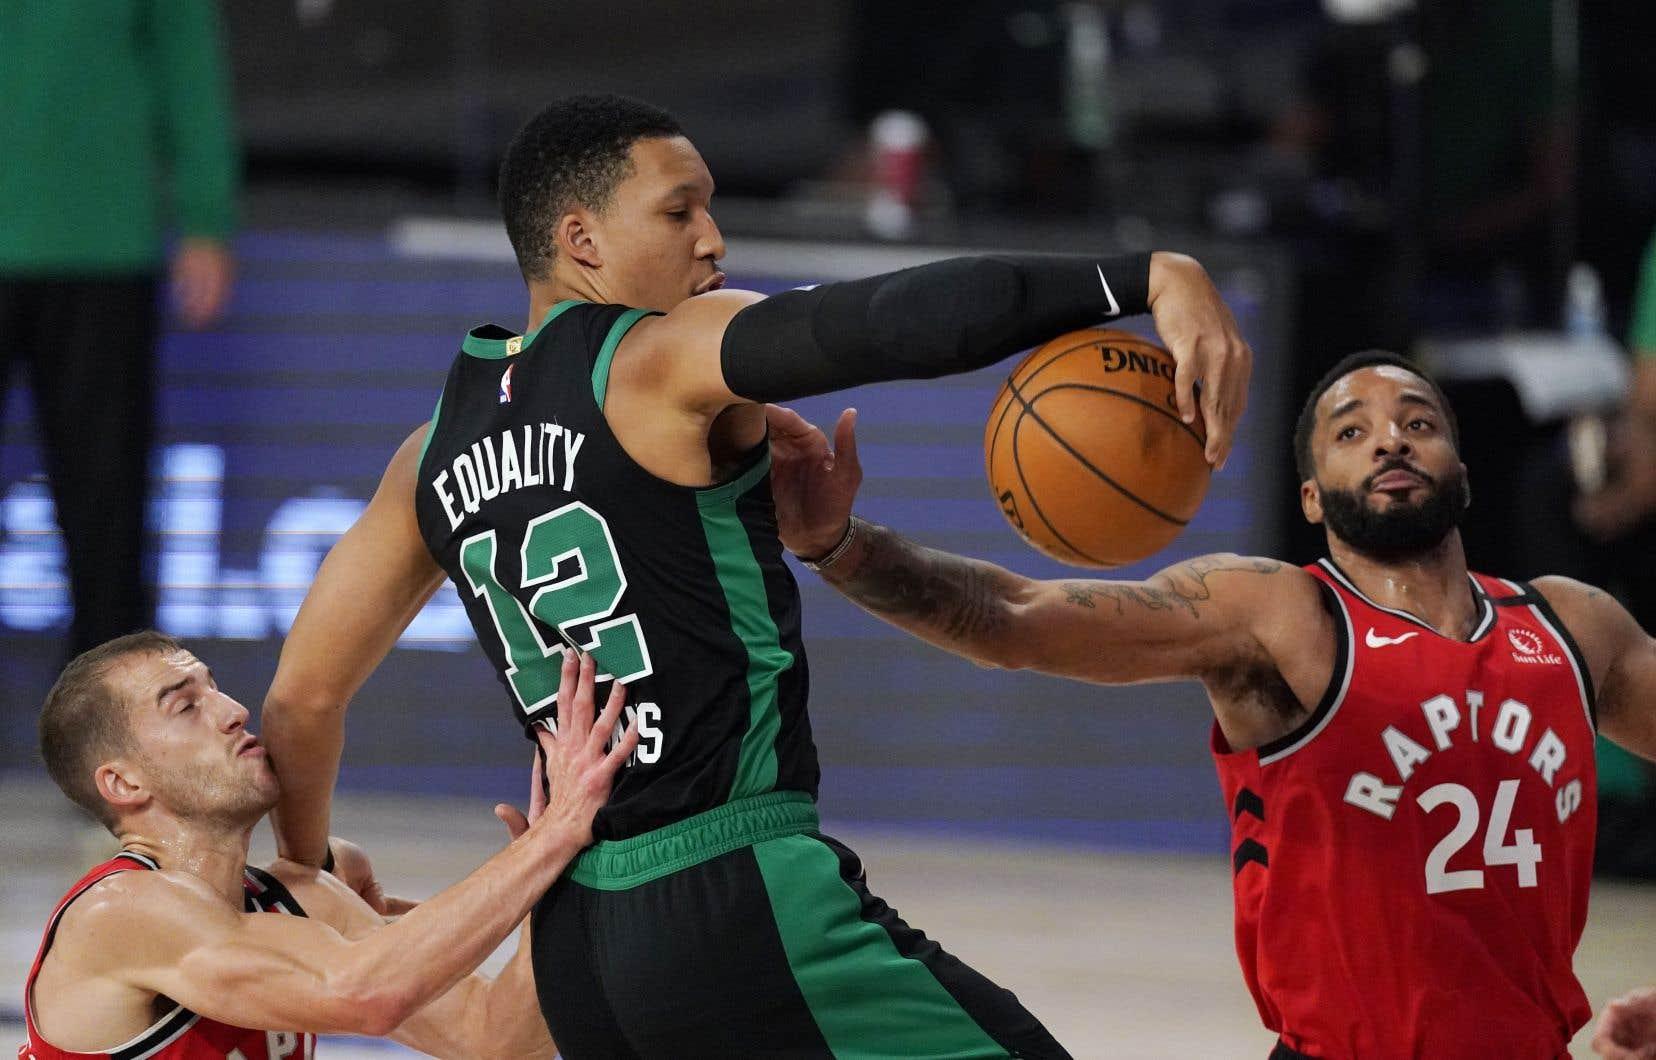 Les Celtics de Boston ont facilement battu les Raptors de Toronto 111-89, lundi soir.